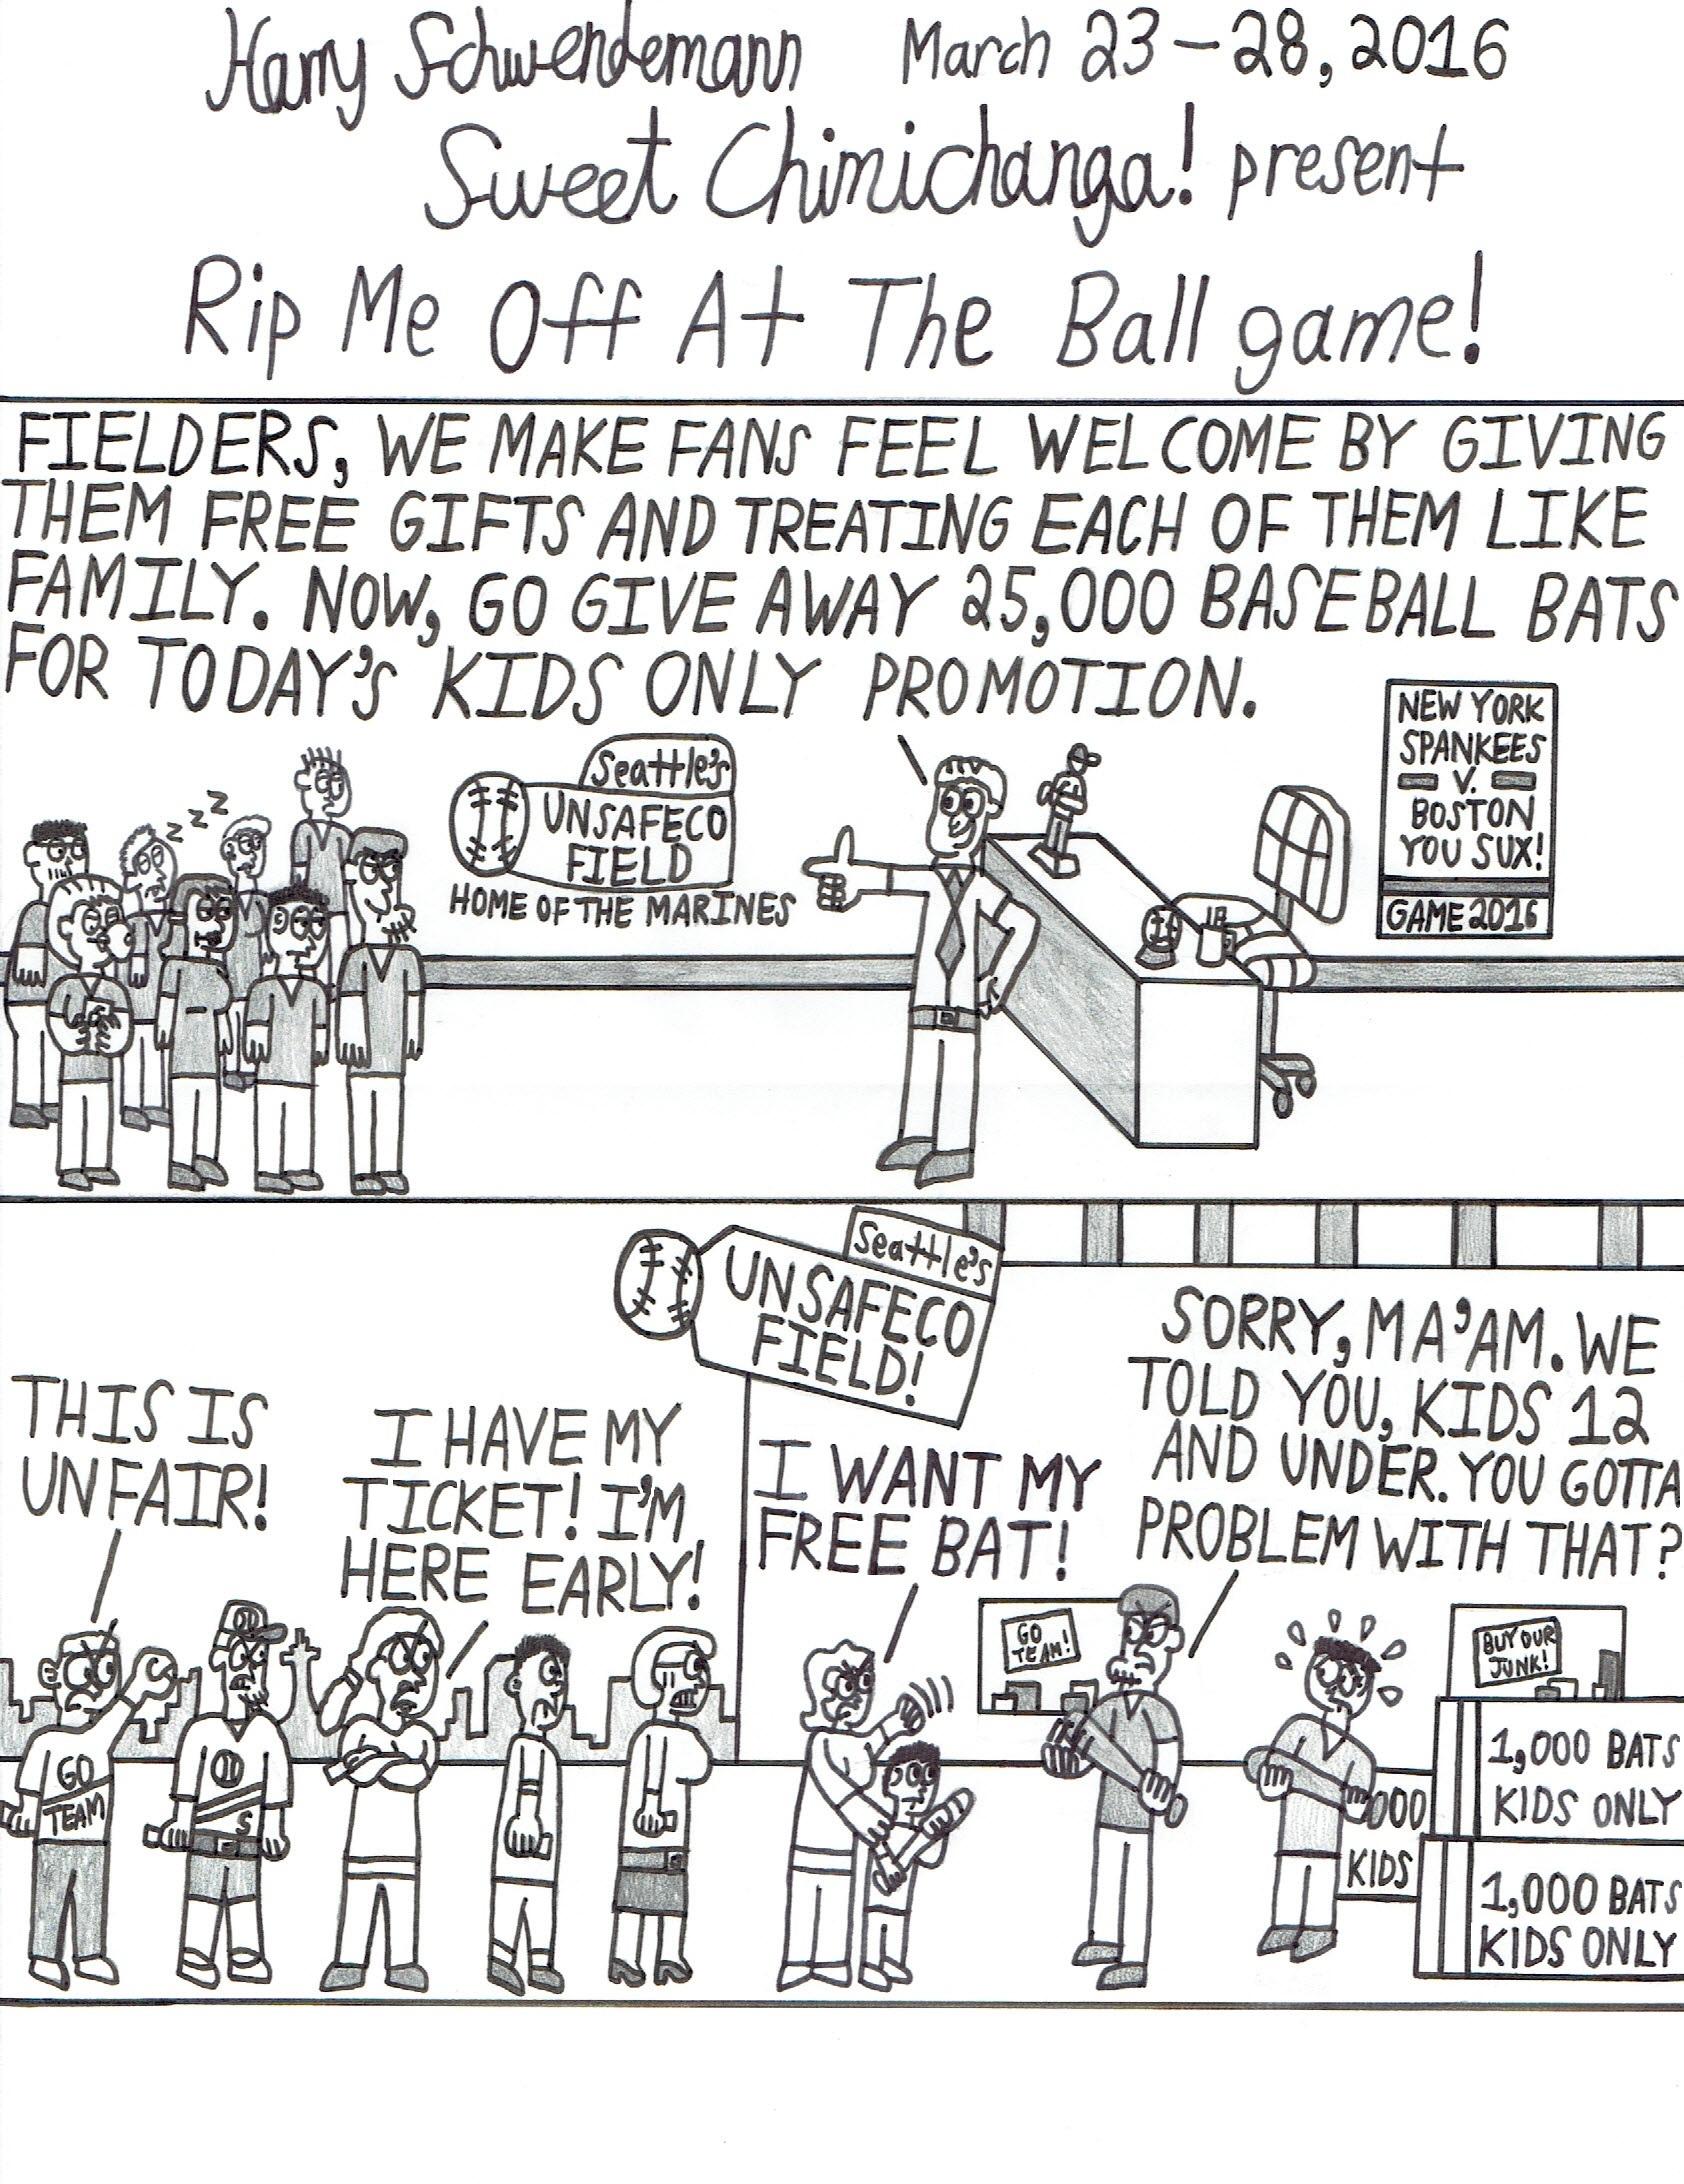 Rip Me Off At The Ballgame!